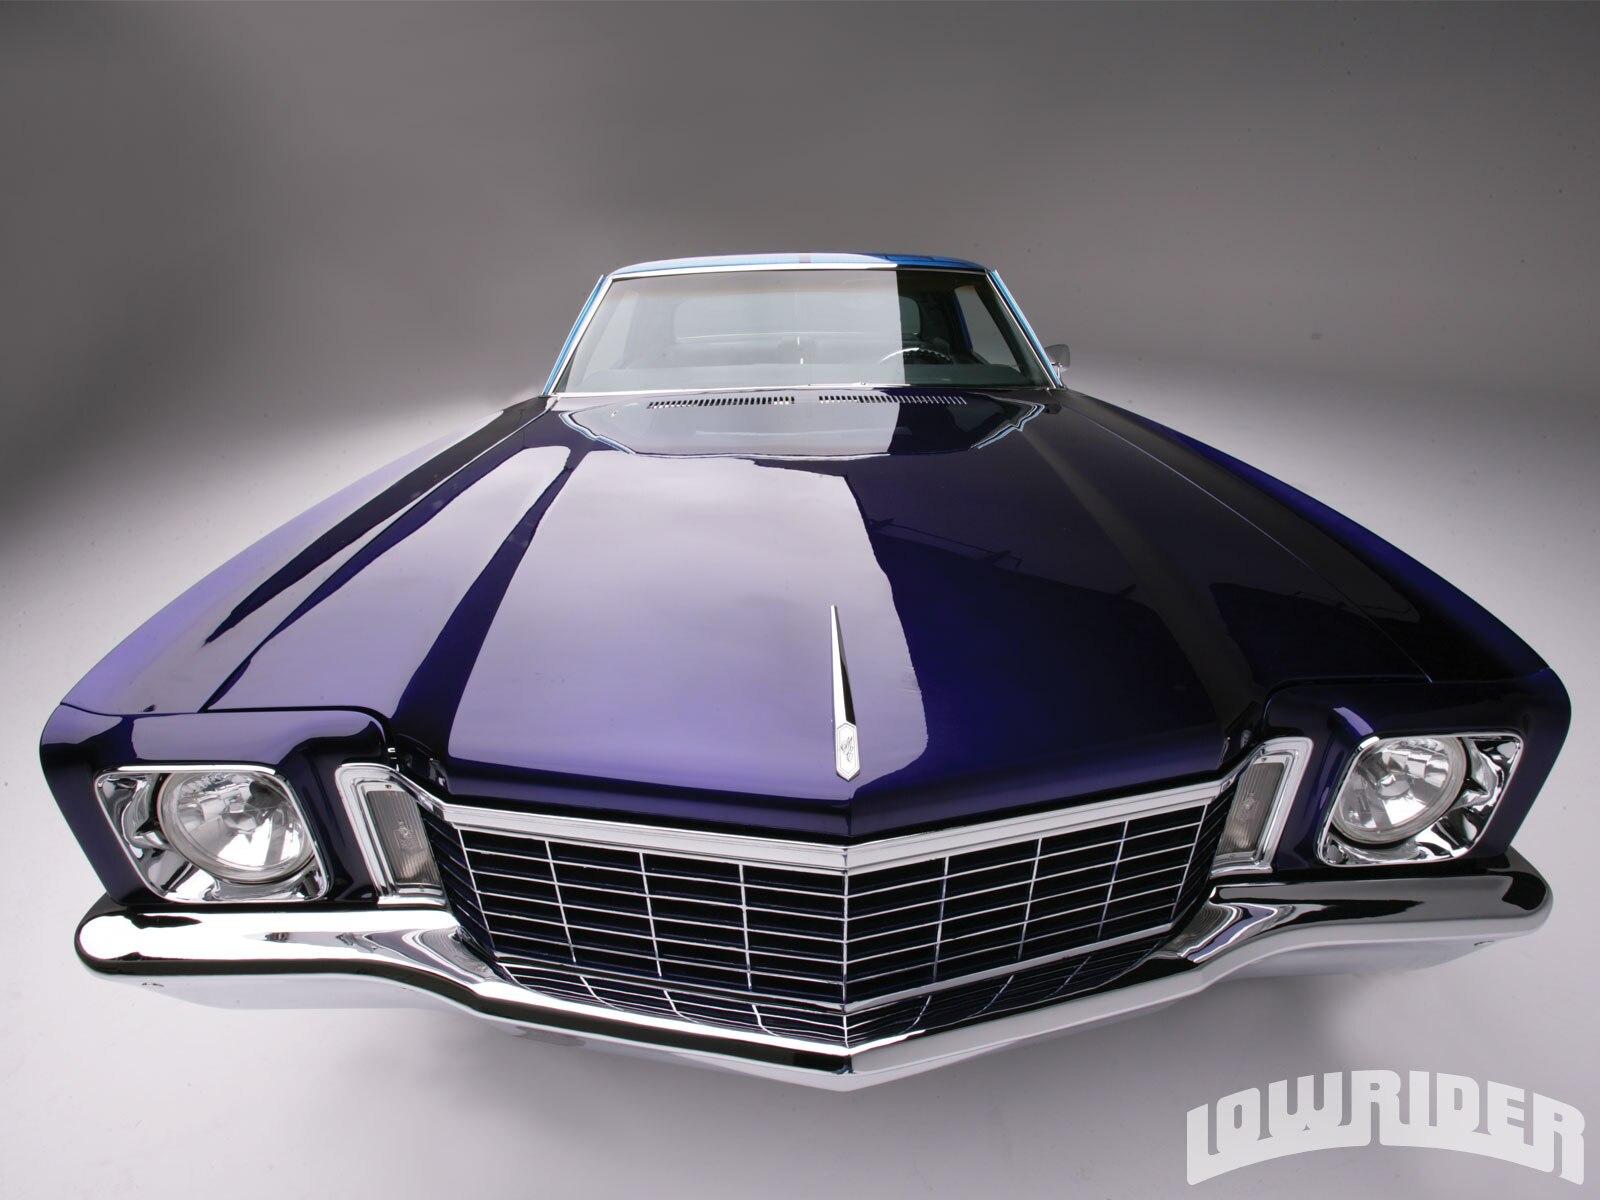 lrmp-1007-12-o-1972-chevy-monte-carlo-hood3